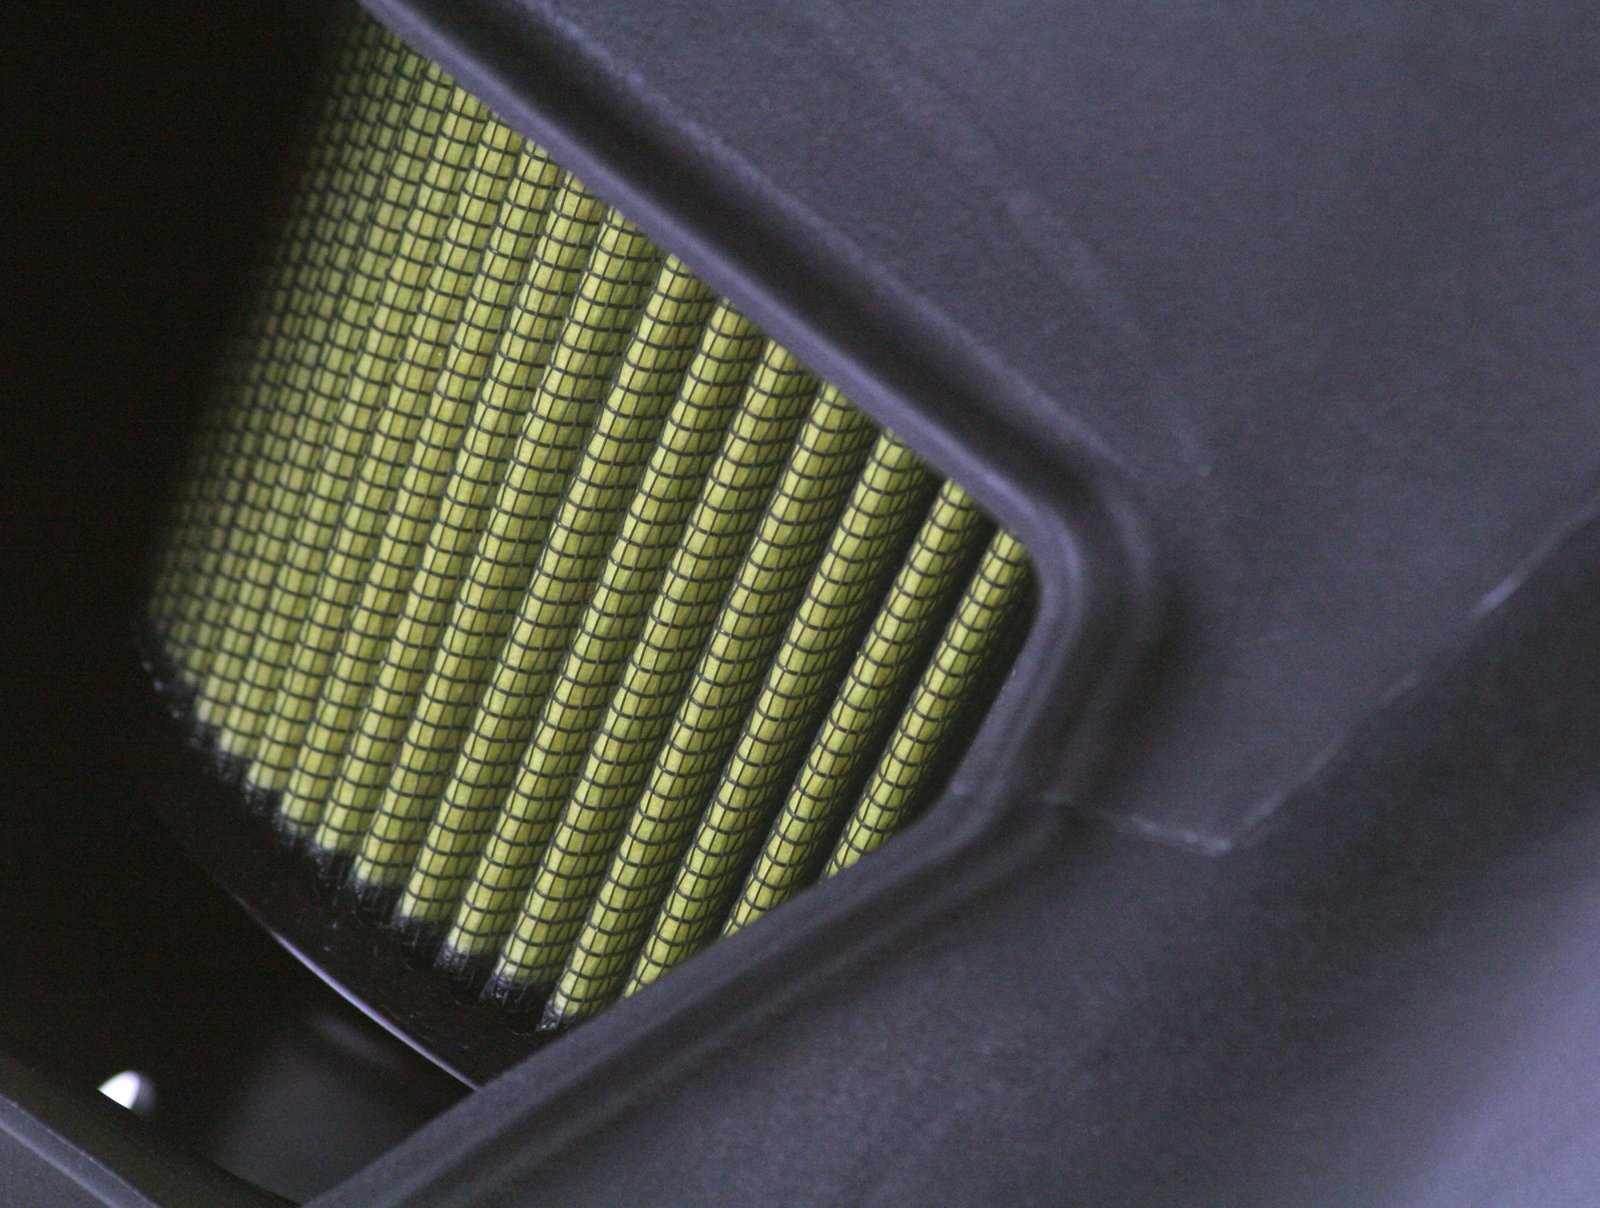 aFe Power Magnum FORCE 75-82032 Dodge Diesel Trucks 10-12 L6-6.7L (td) Performance Intake System (Oiled, 7-Layer Filter) by aFe Power (Image #7)